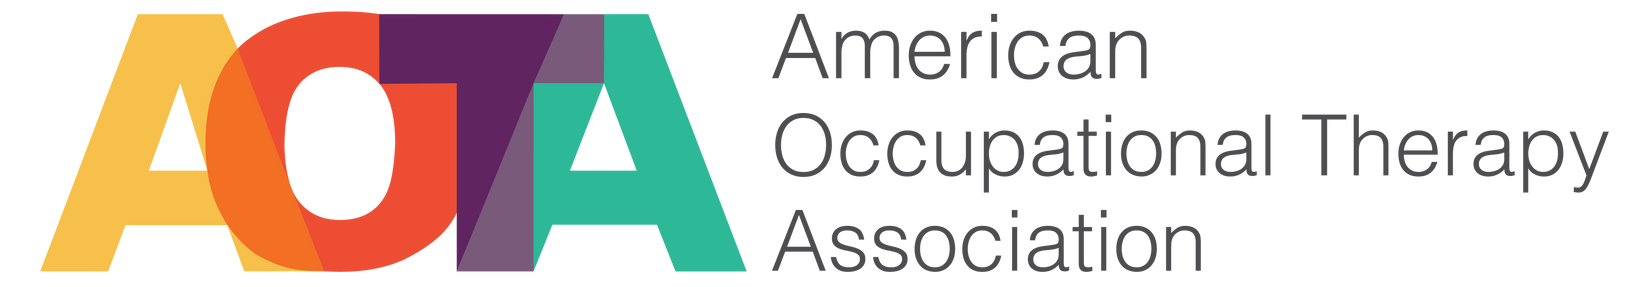 AOTA_Full-Color-Logo_Association_HORIZON